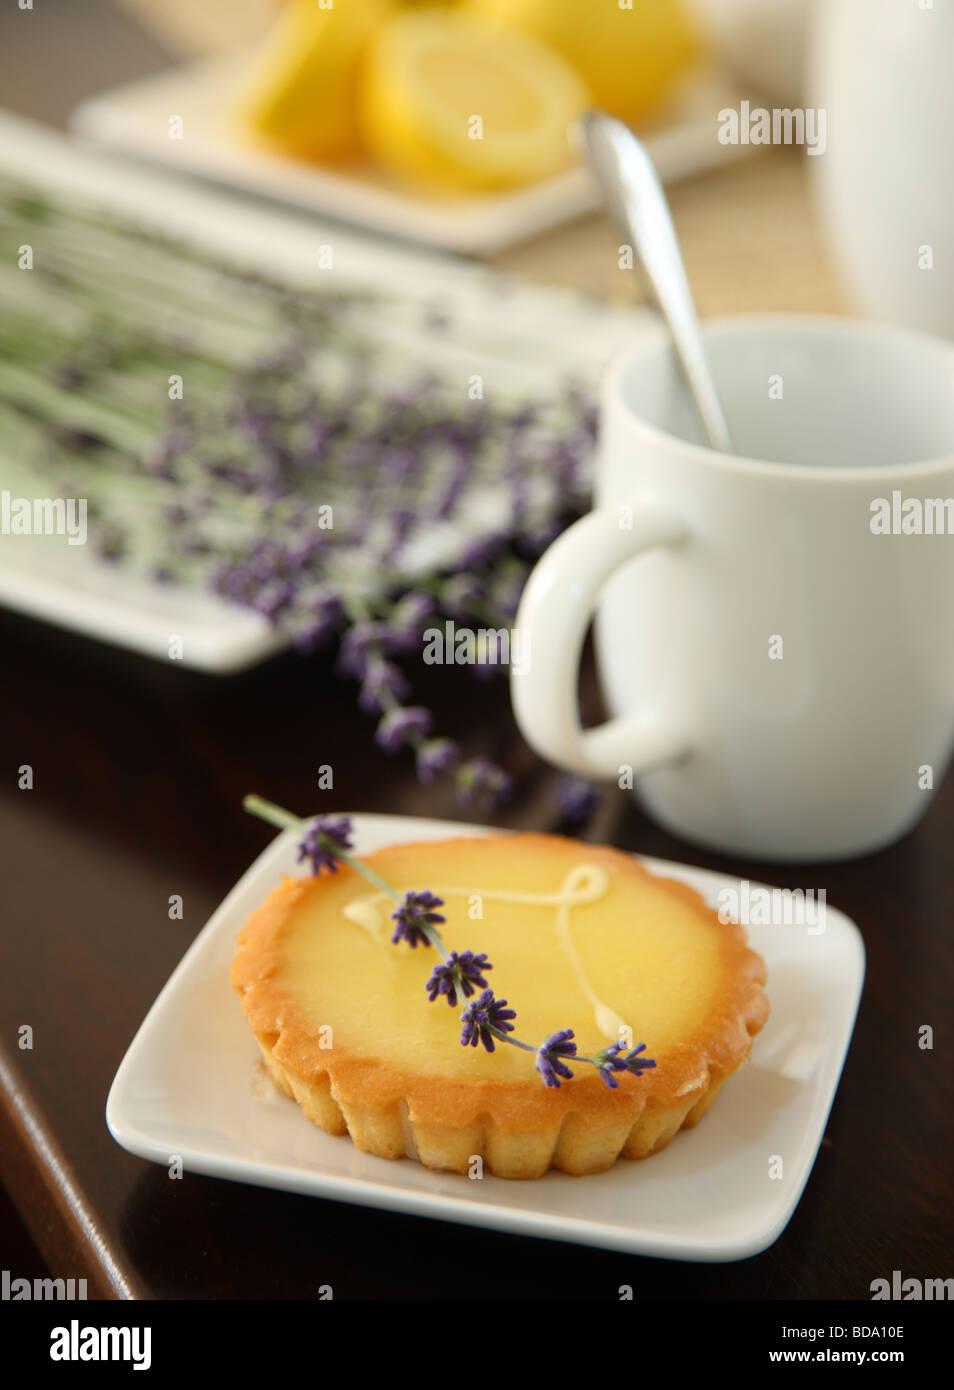 Lemon tart with lavender - Stock Image